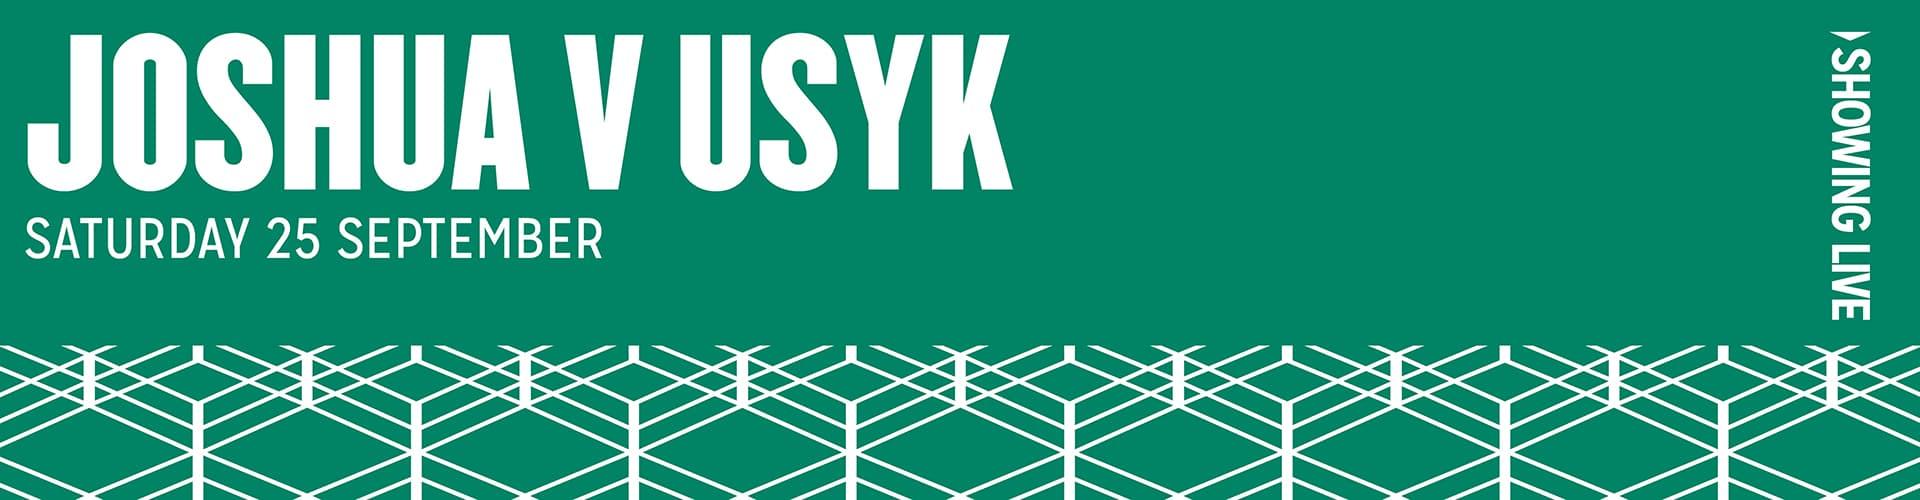 Watch Anthony Joshua vs Usyk Live